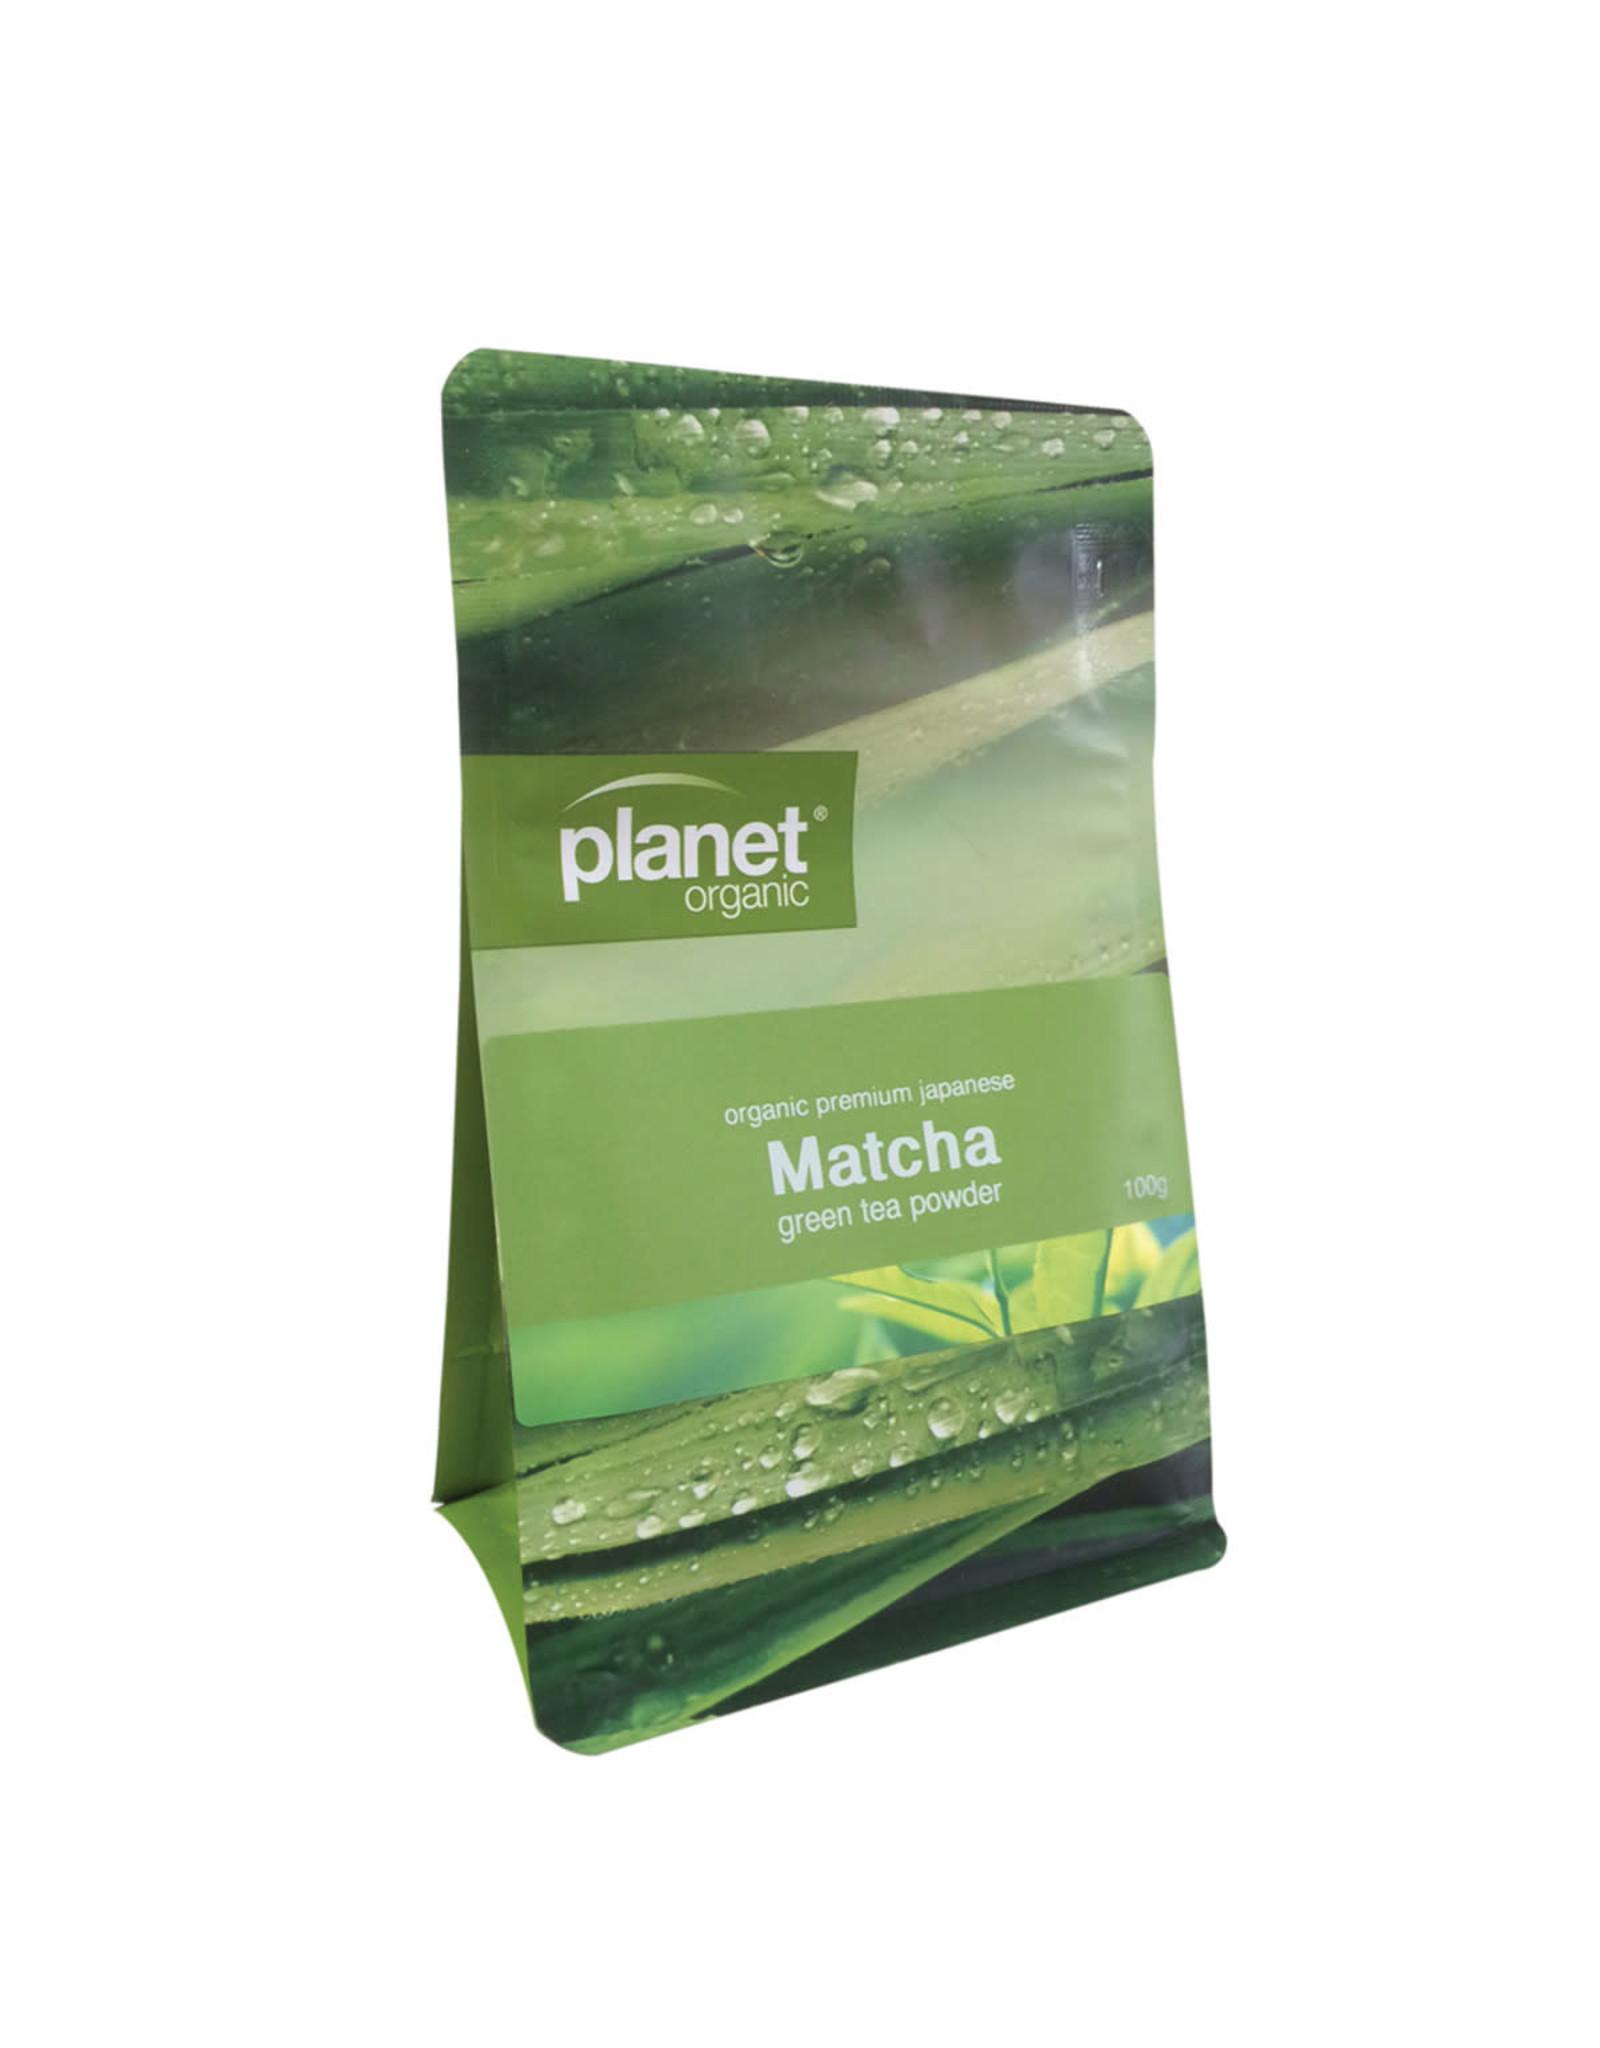 Planet Organic Matcha Green Tea Powder - Organic - 100g